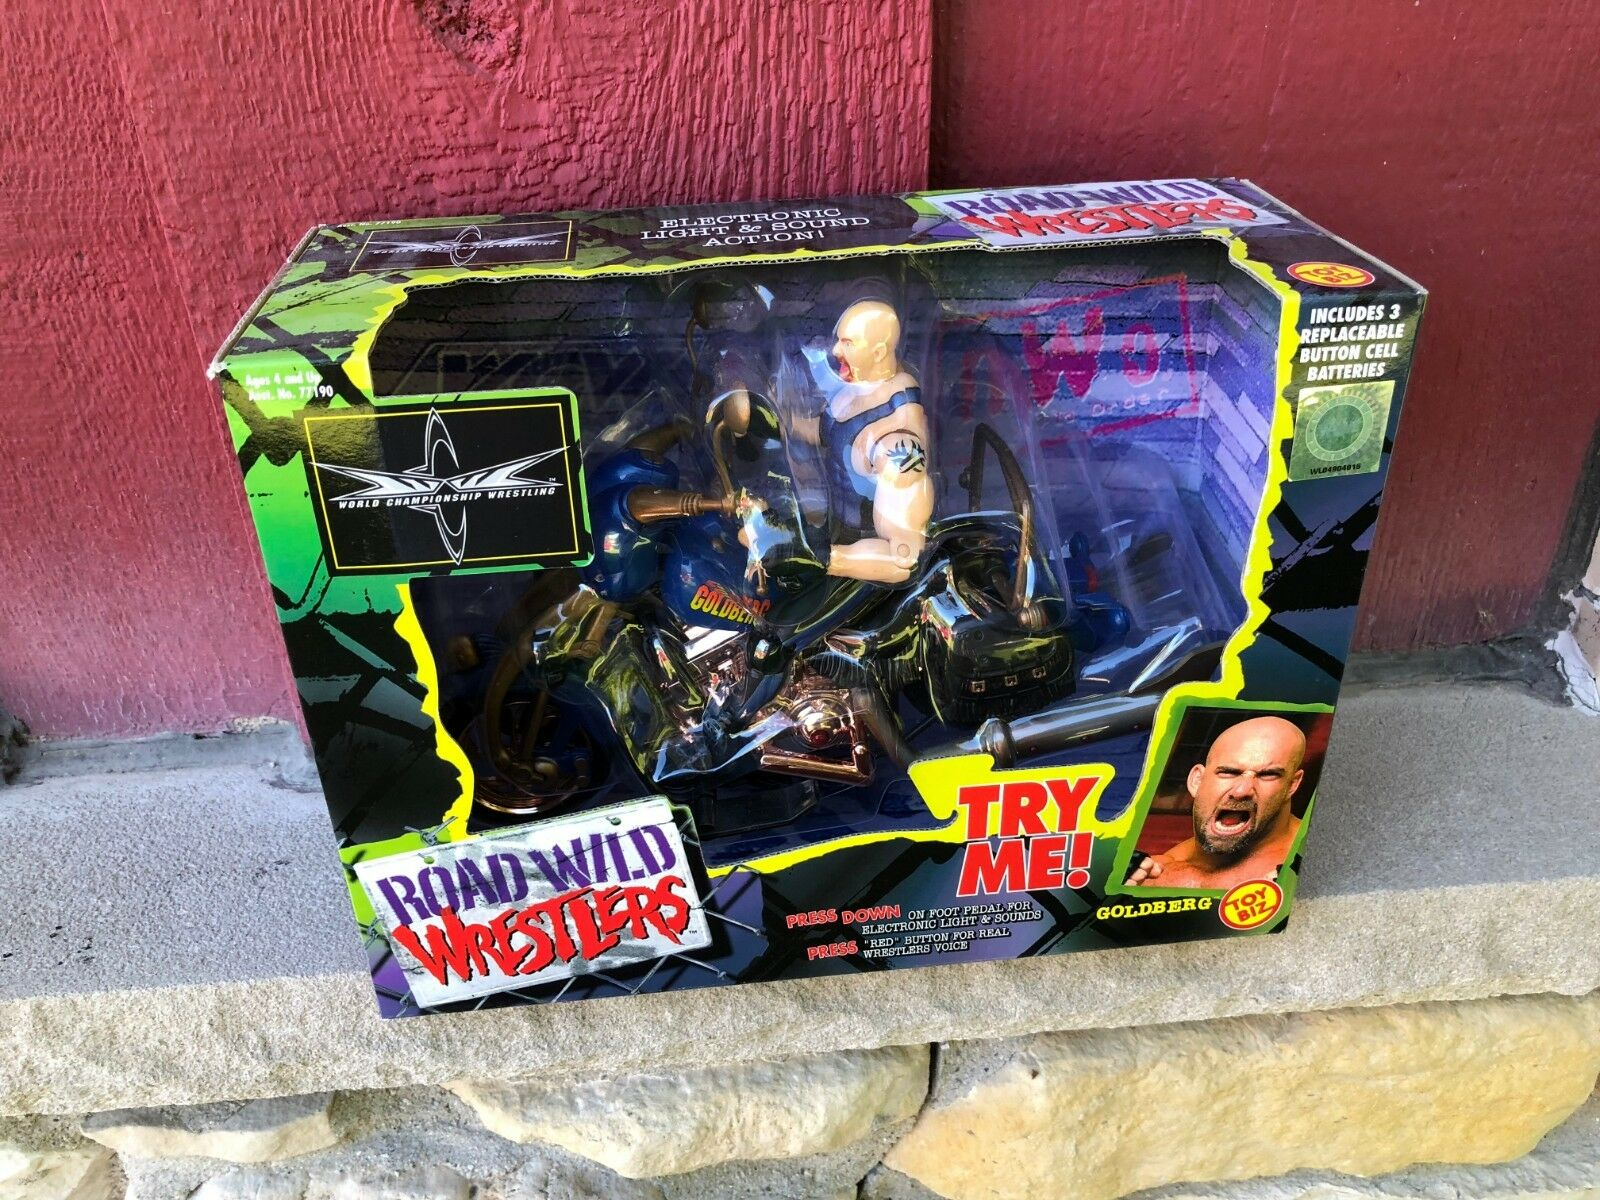 1999 NRFB WCW NWA Road Wild Wrestlers Motorcycle goldberg - Toy Biz  (s22)